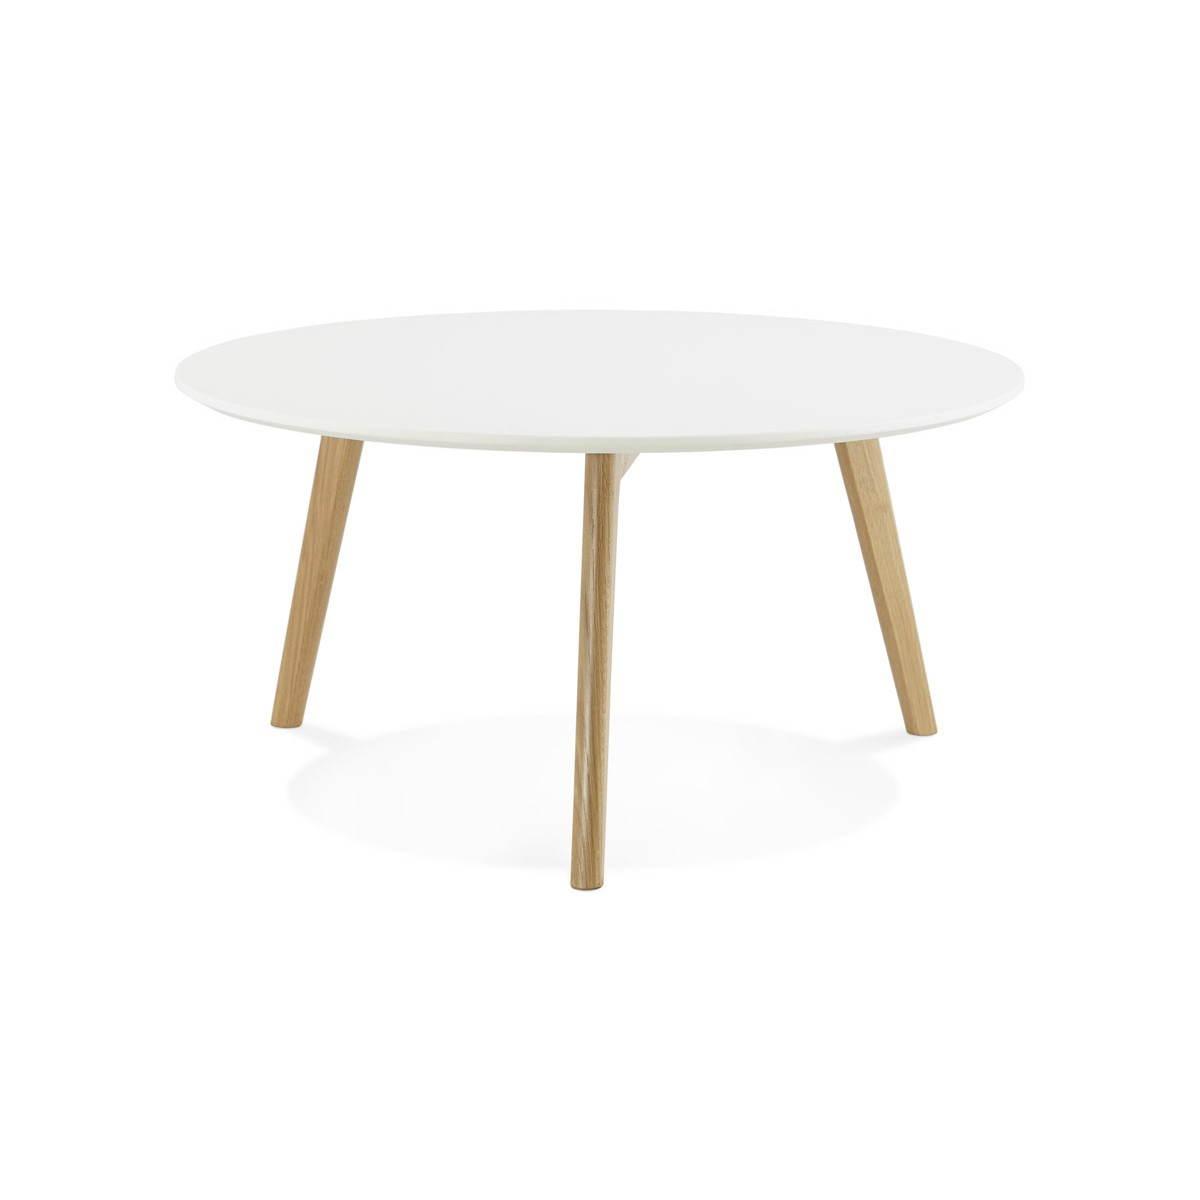 Tarot Scandinavian Coffee Table In Wood And Oak White